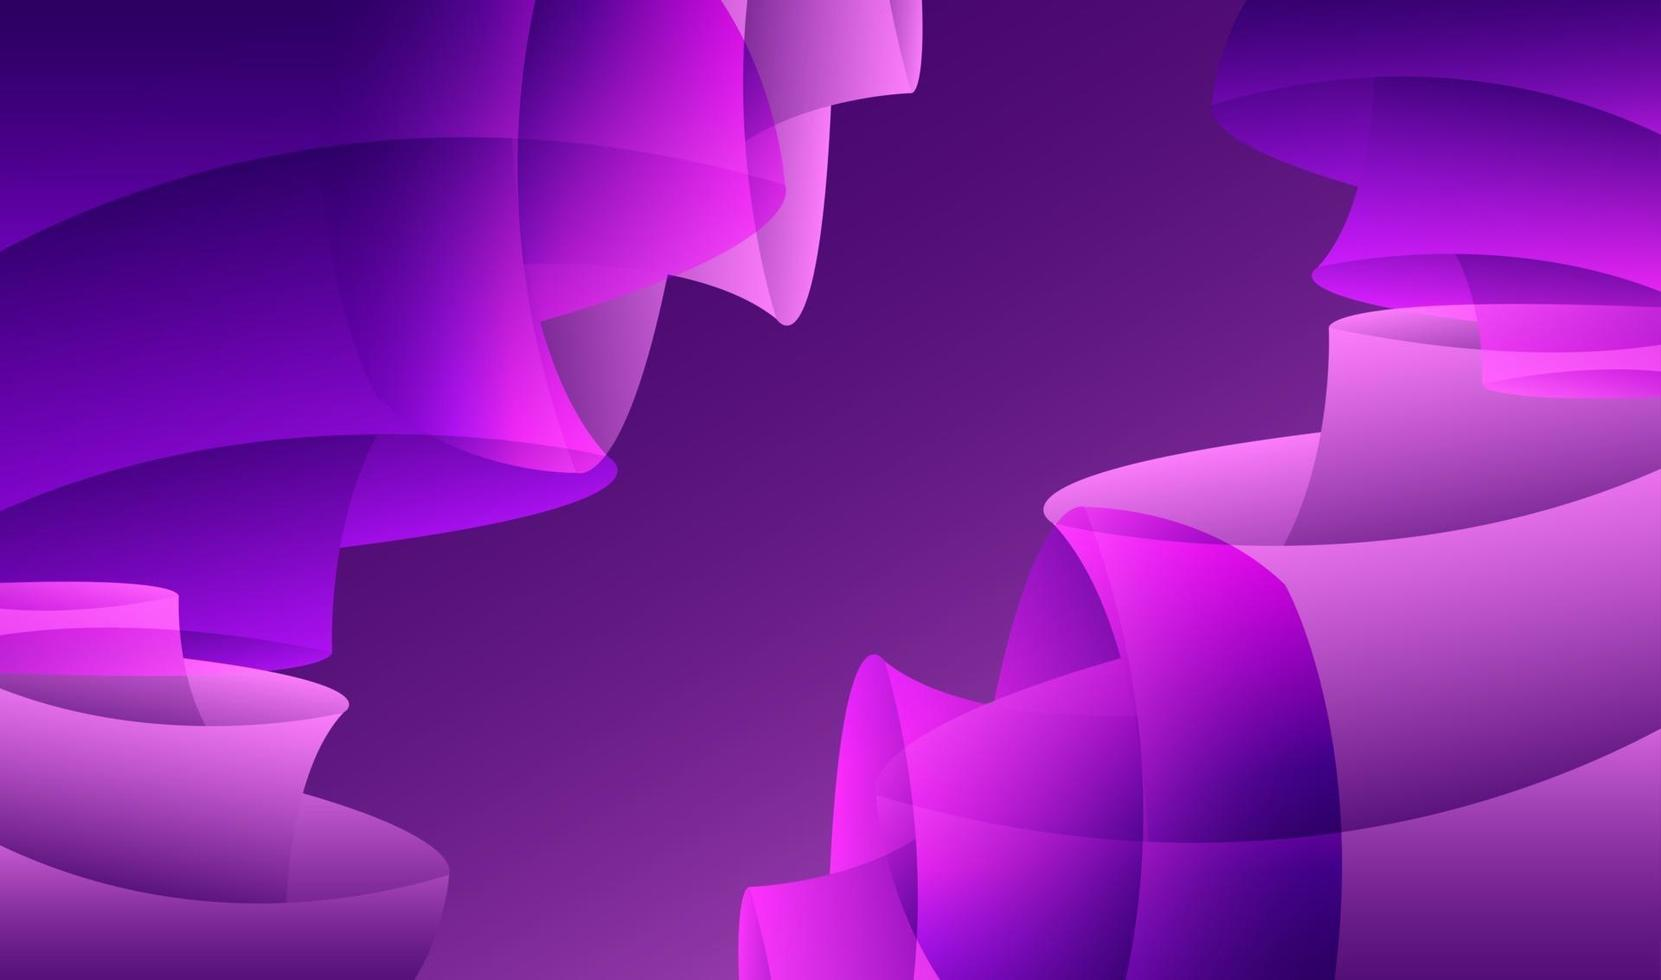 fondo geométrico degradado abstracto moderno vector